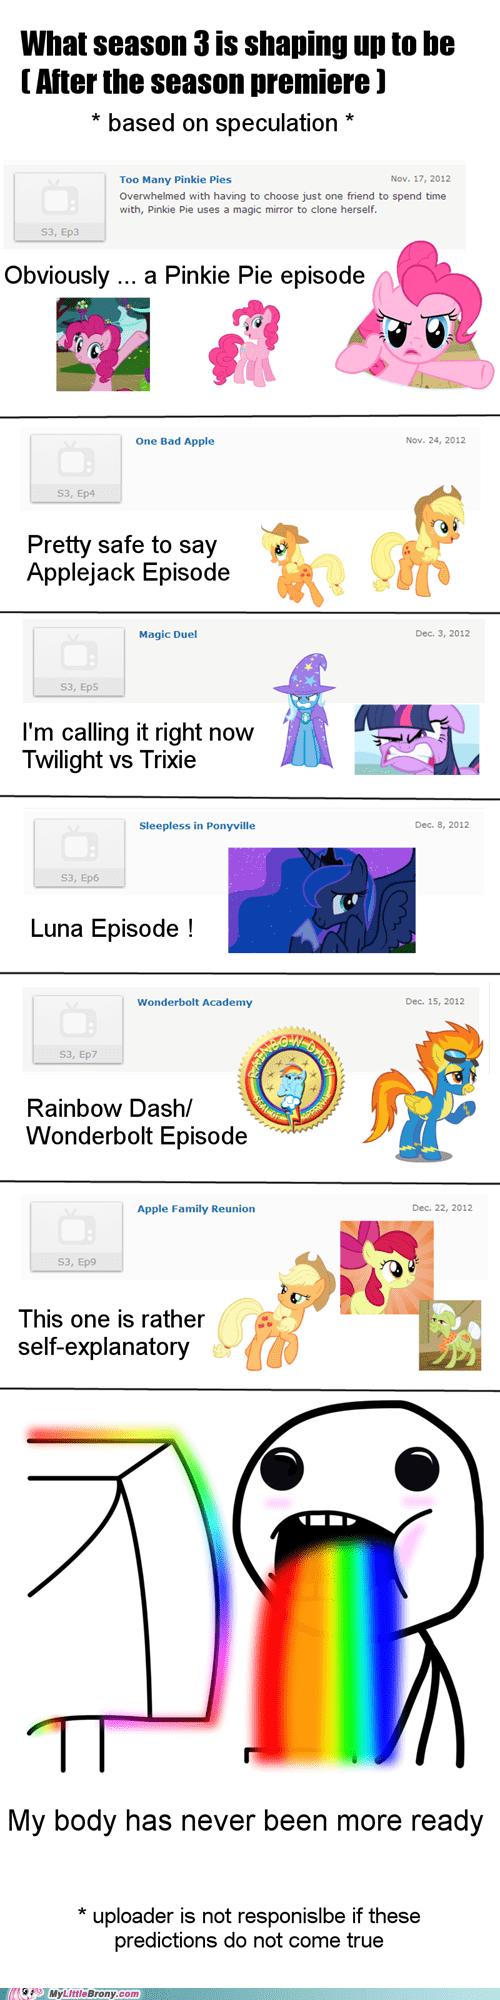 season 3 episodes hype speculation - 6726346240